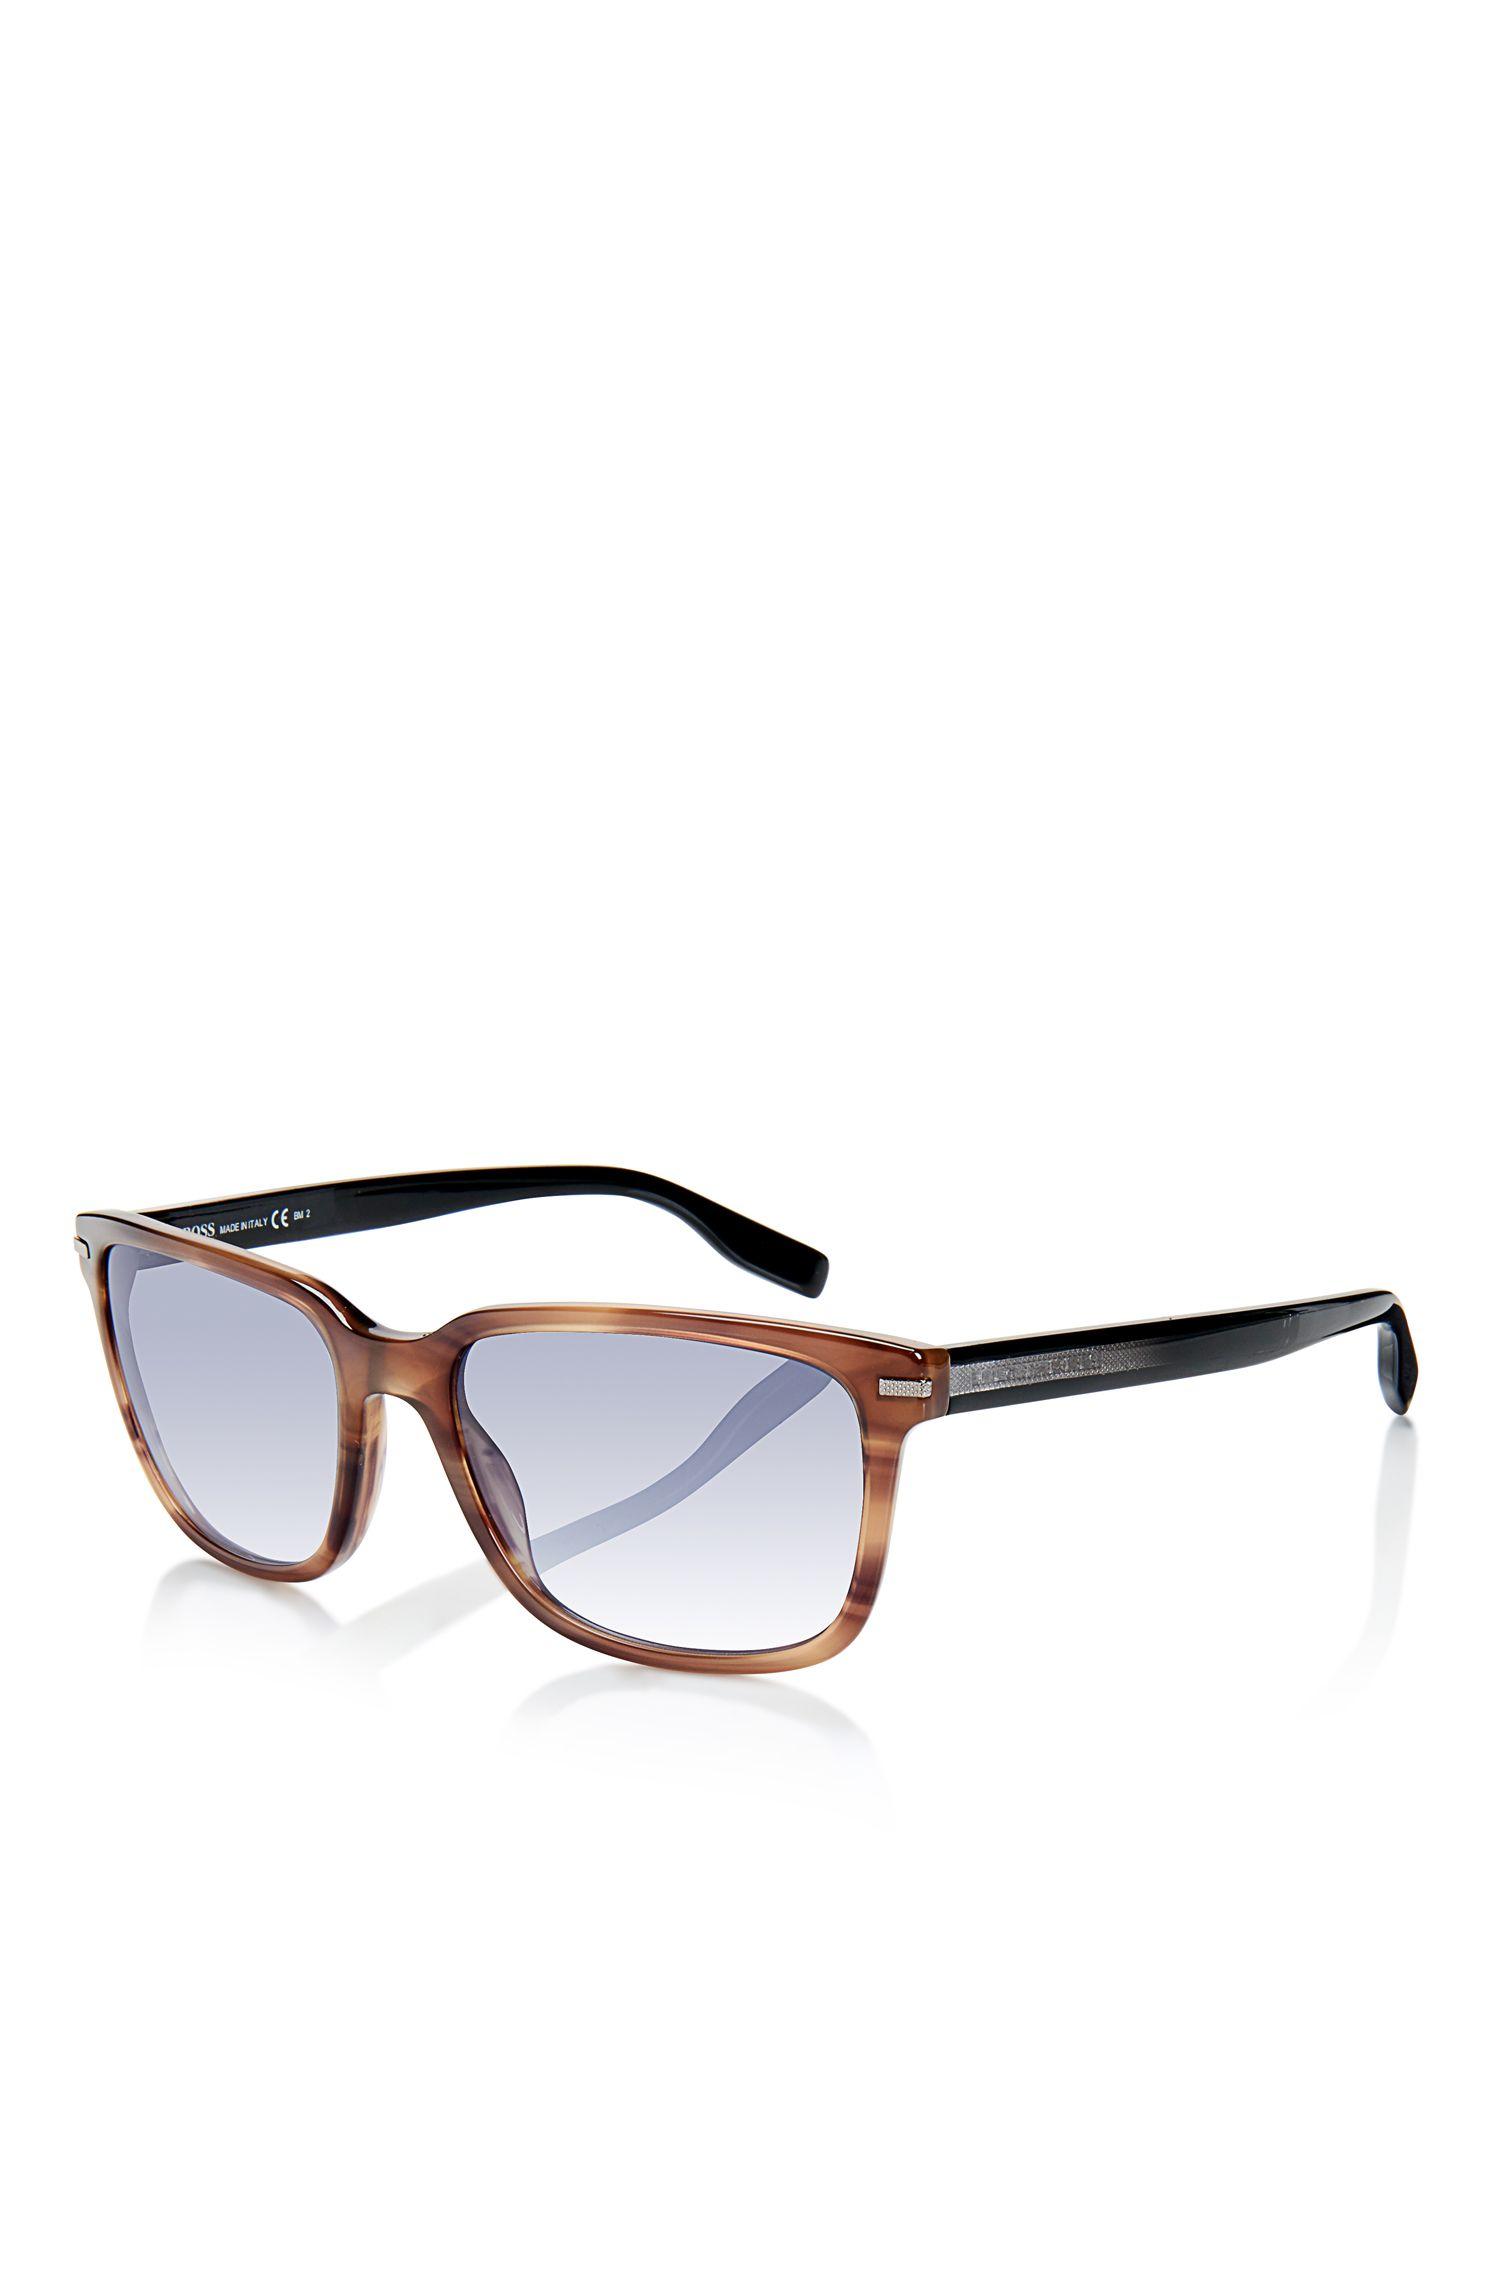 'Sunglasses' | Grey Gradient Lens Sunglasses